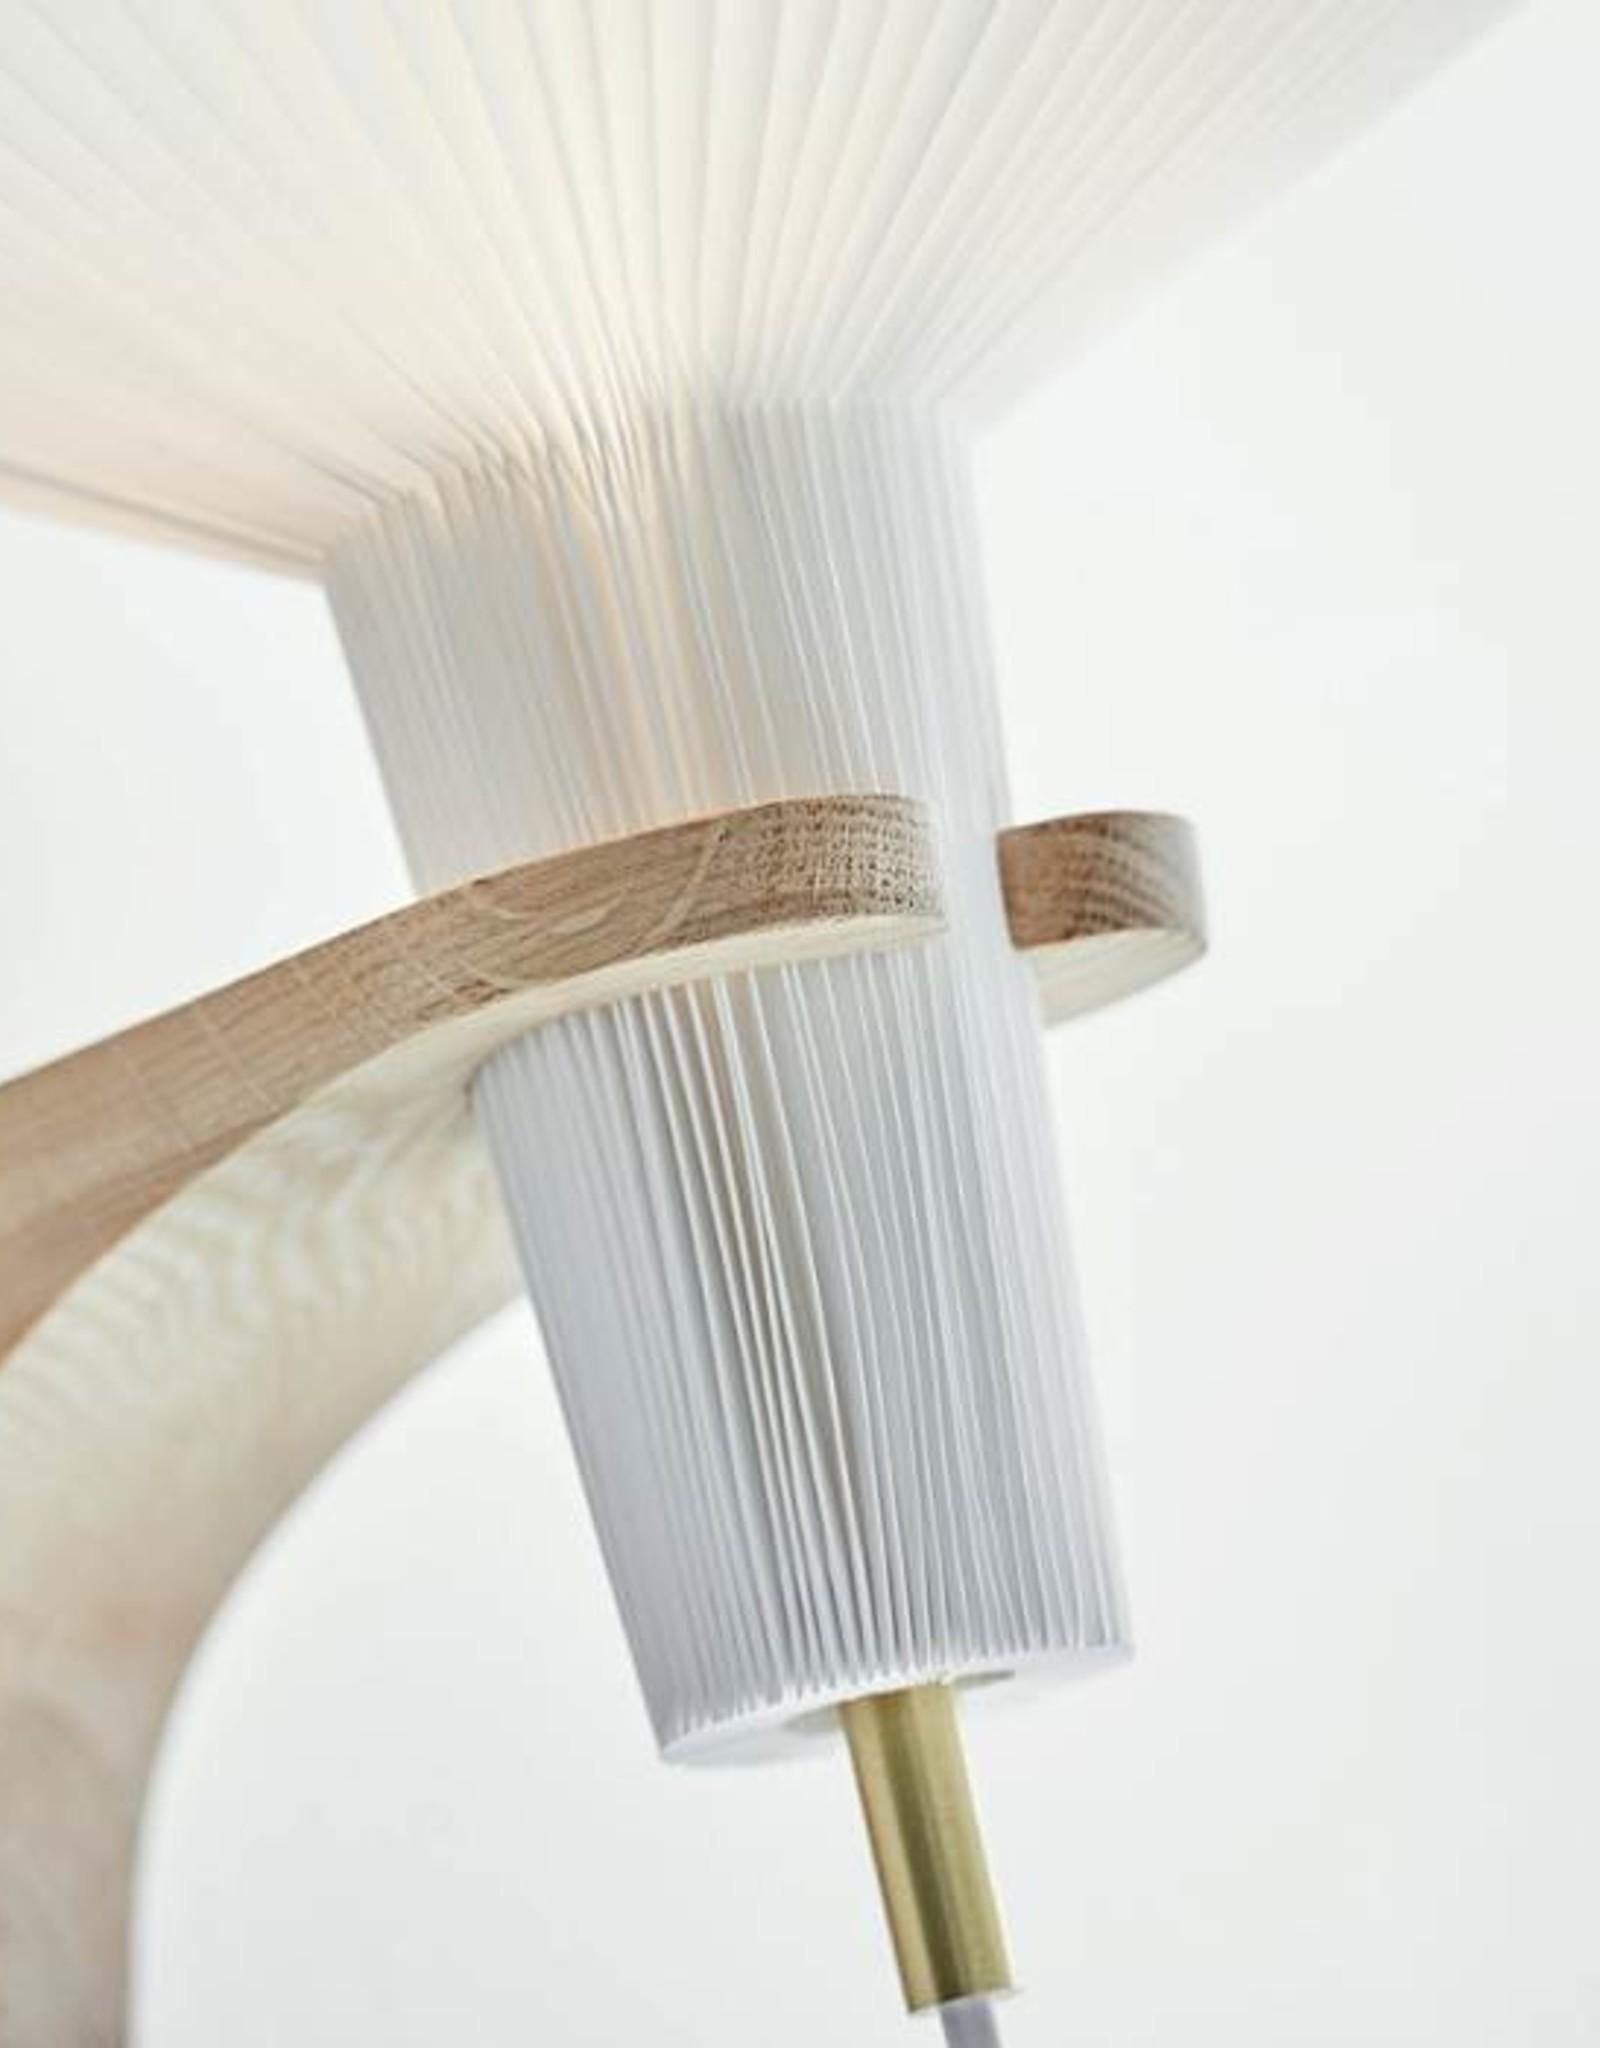 Mushroom 204 wall light by Vilhelm Wohlert | Plastic | Oak